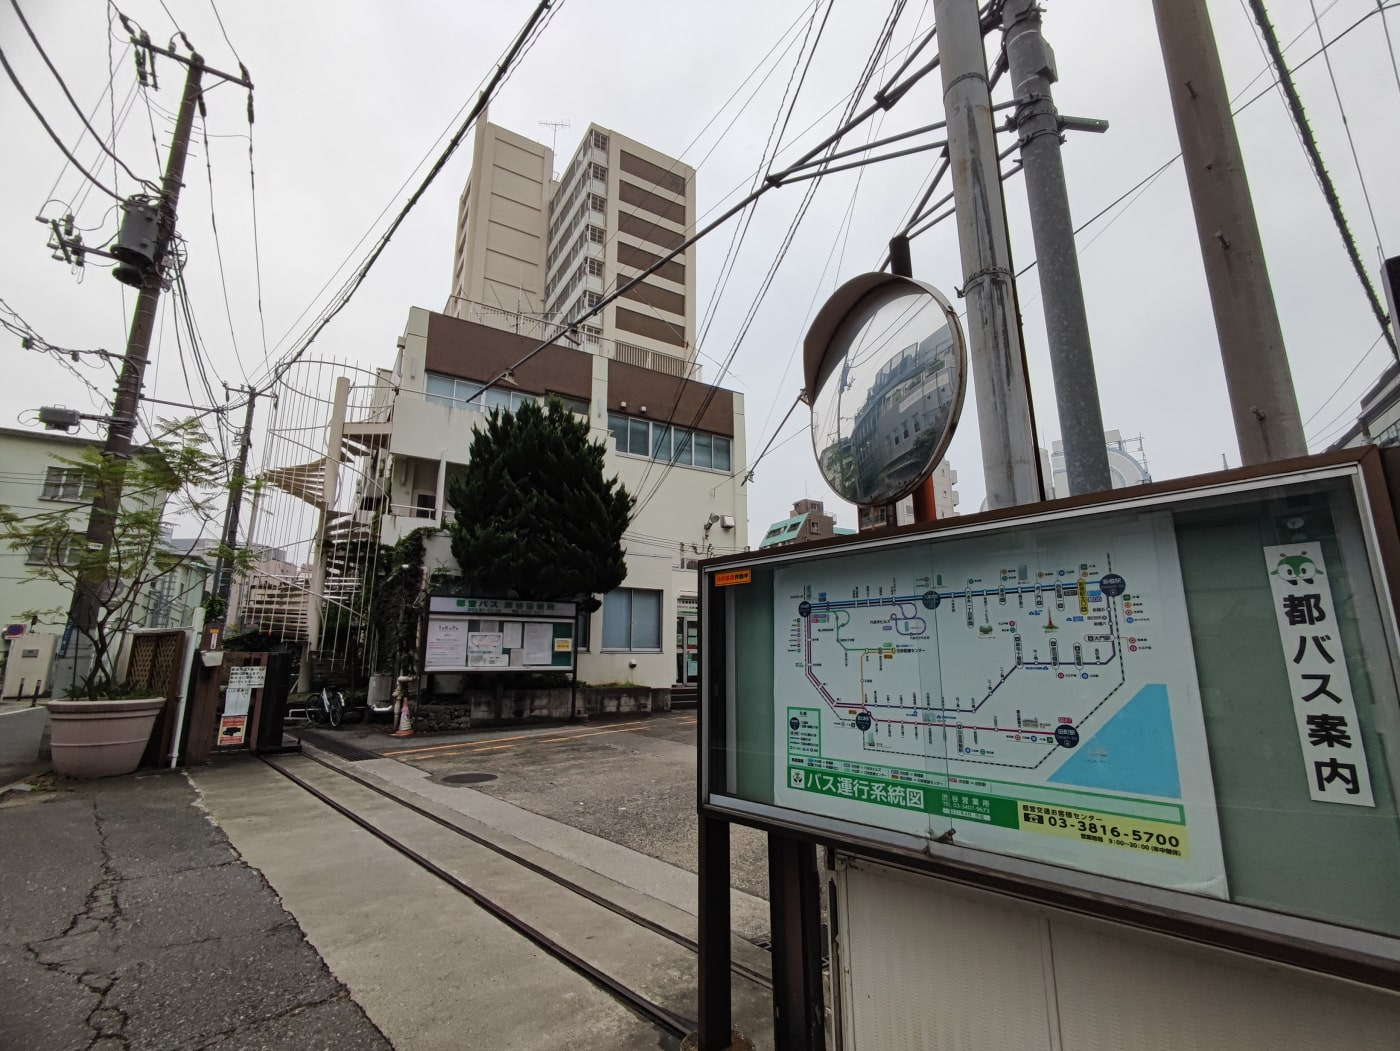 都営バス渋谷営業所